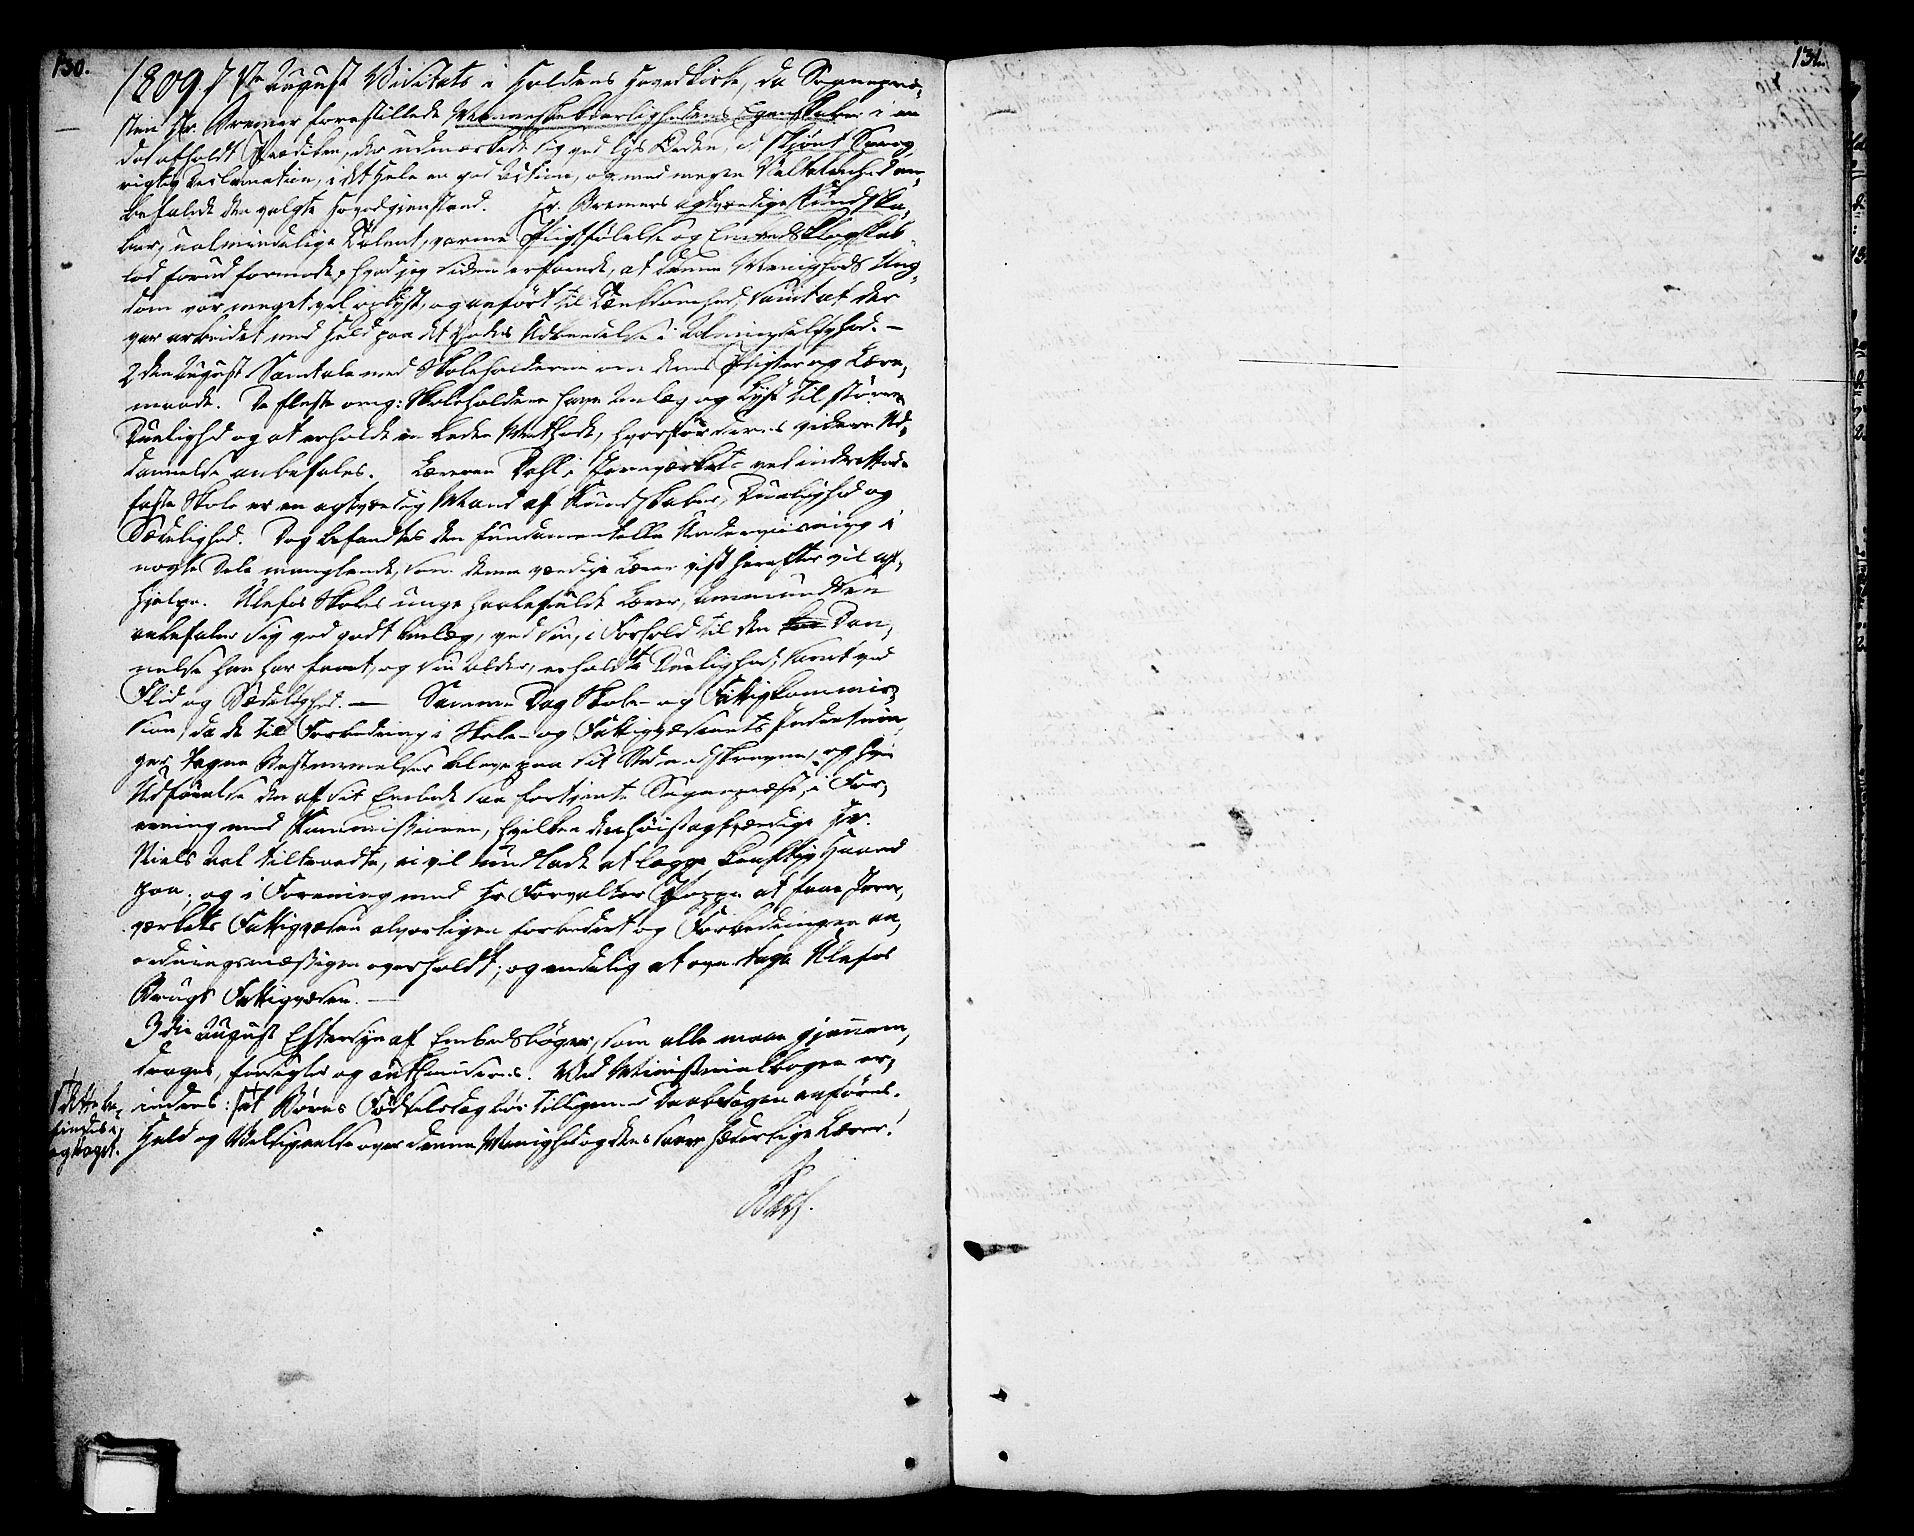 SAKO, Holla kirkebøker, F/Fa/L0002: Ministerialbok nr. 2, 1779-1814, s. 130-131